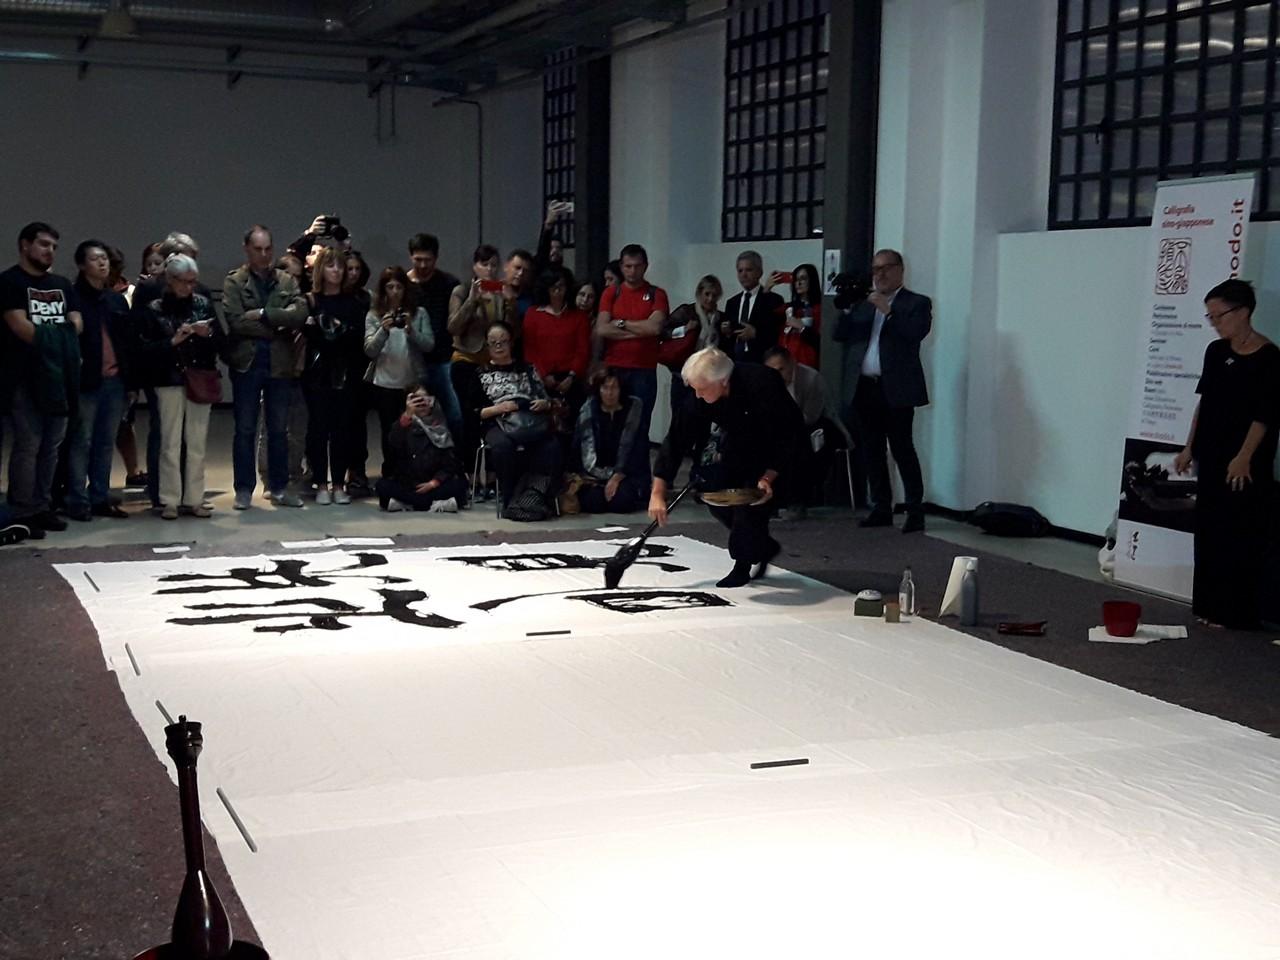 JapanFestival-Milano2018-fotoPagineZeni_023